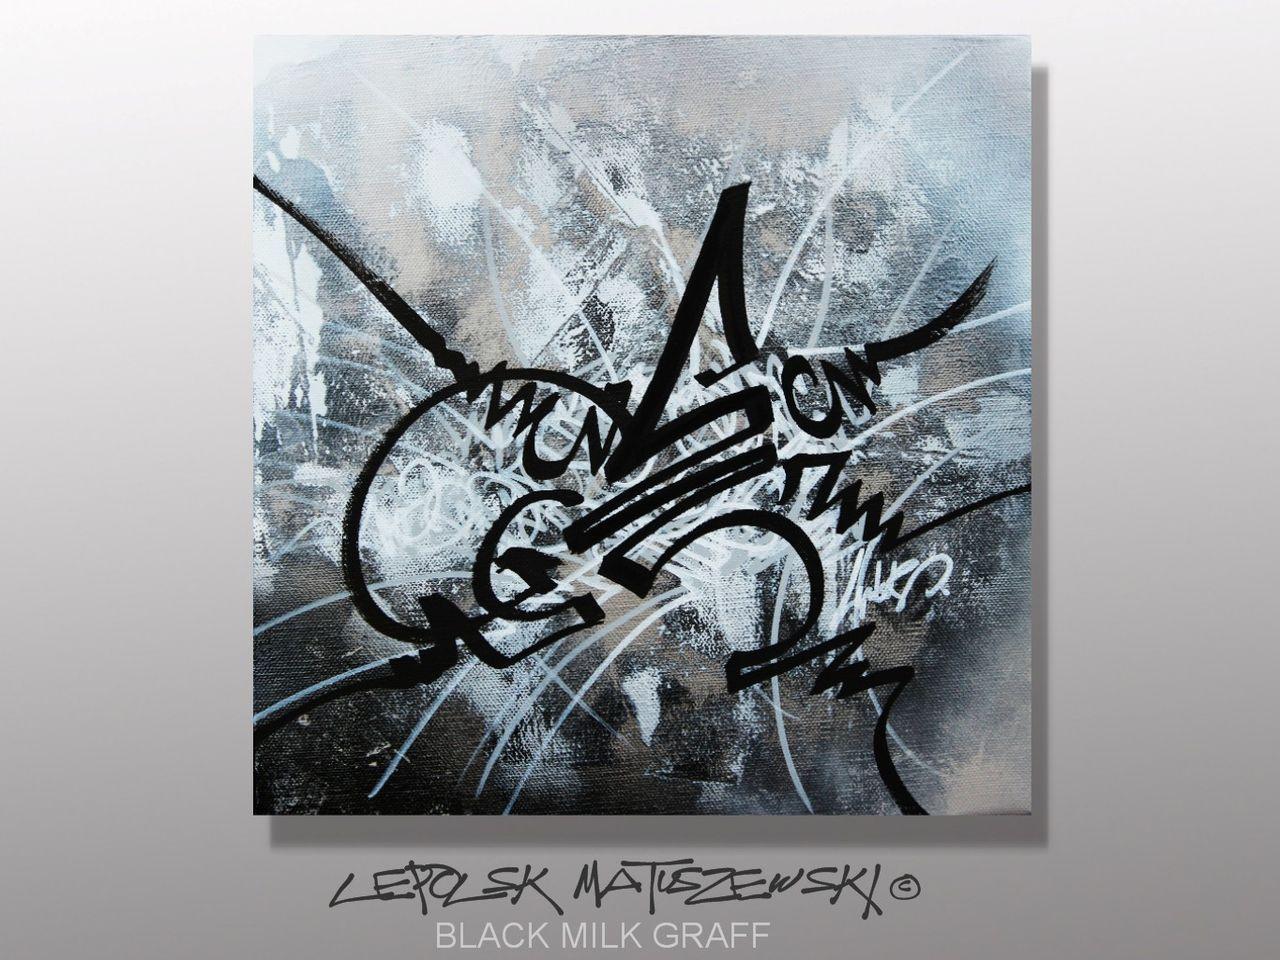 MISTER K  (Lepolsk Matuszewski) BLACK MILK GRAFF